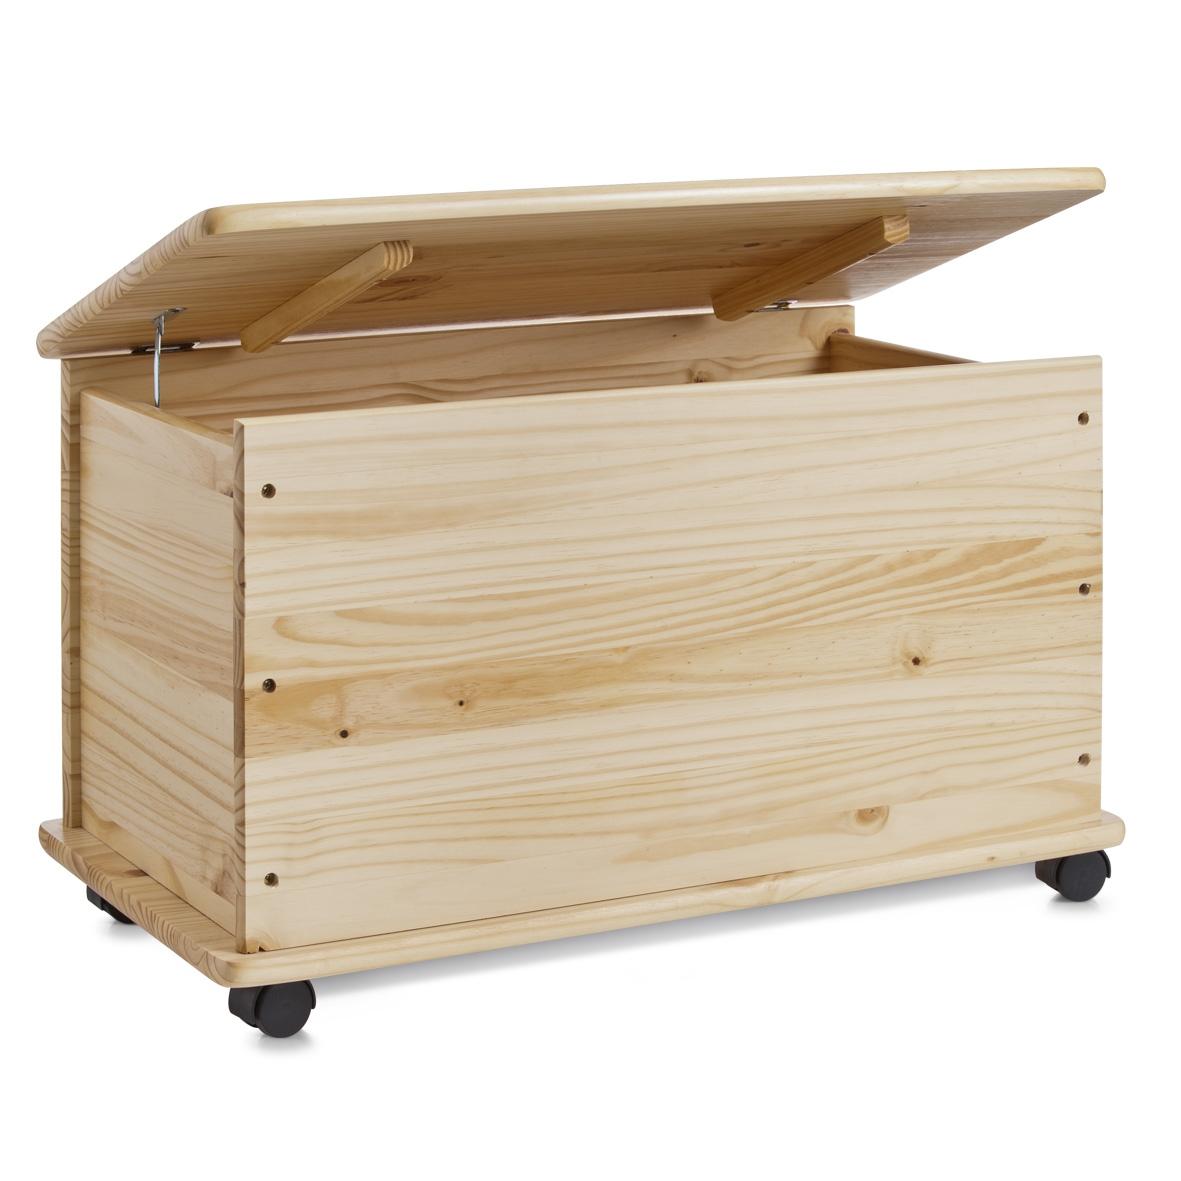 Cutie depozitare jucarii, din lemn de pin, Pine Natural, l73xA39,5xH45 cm poza